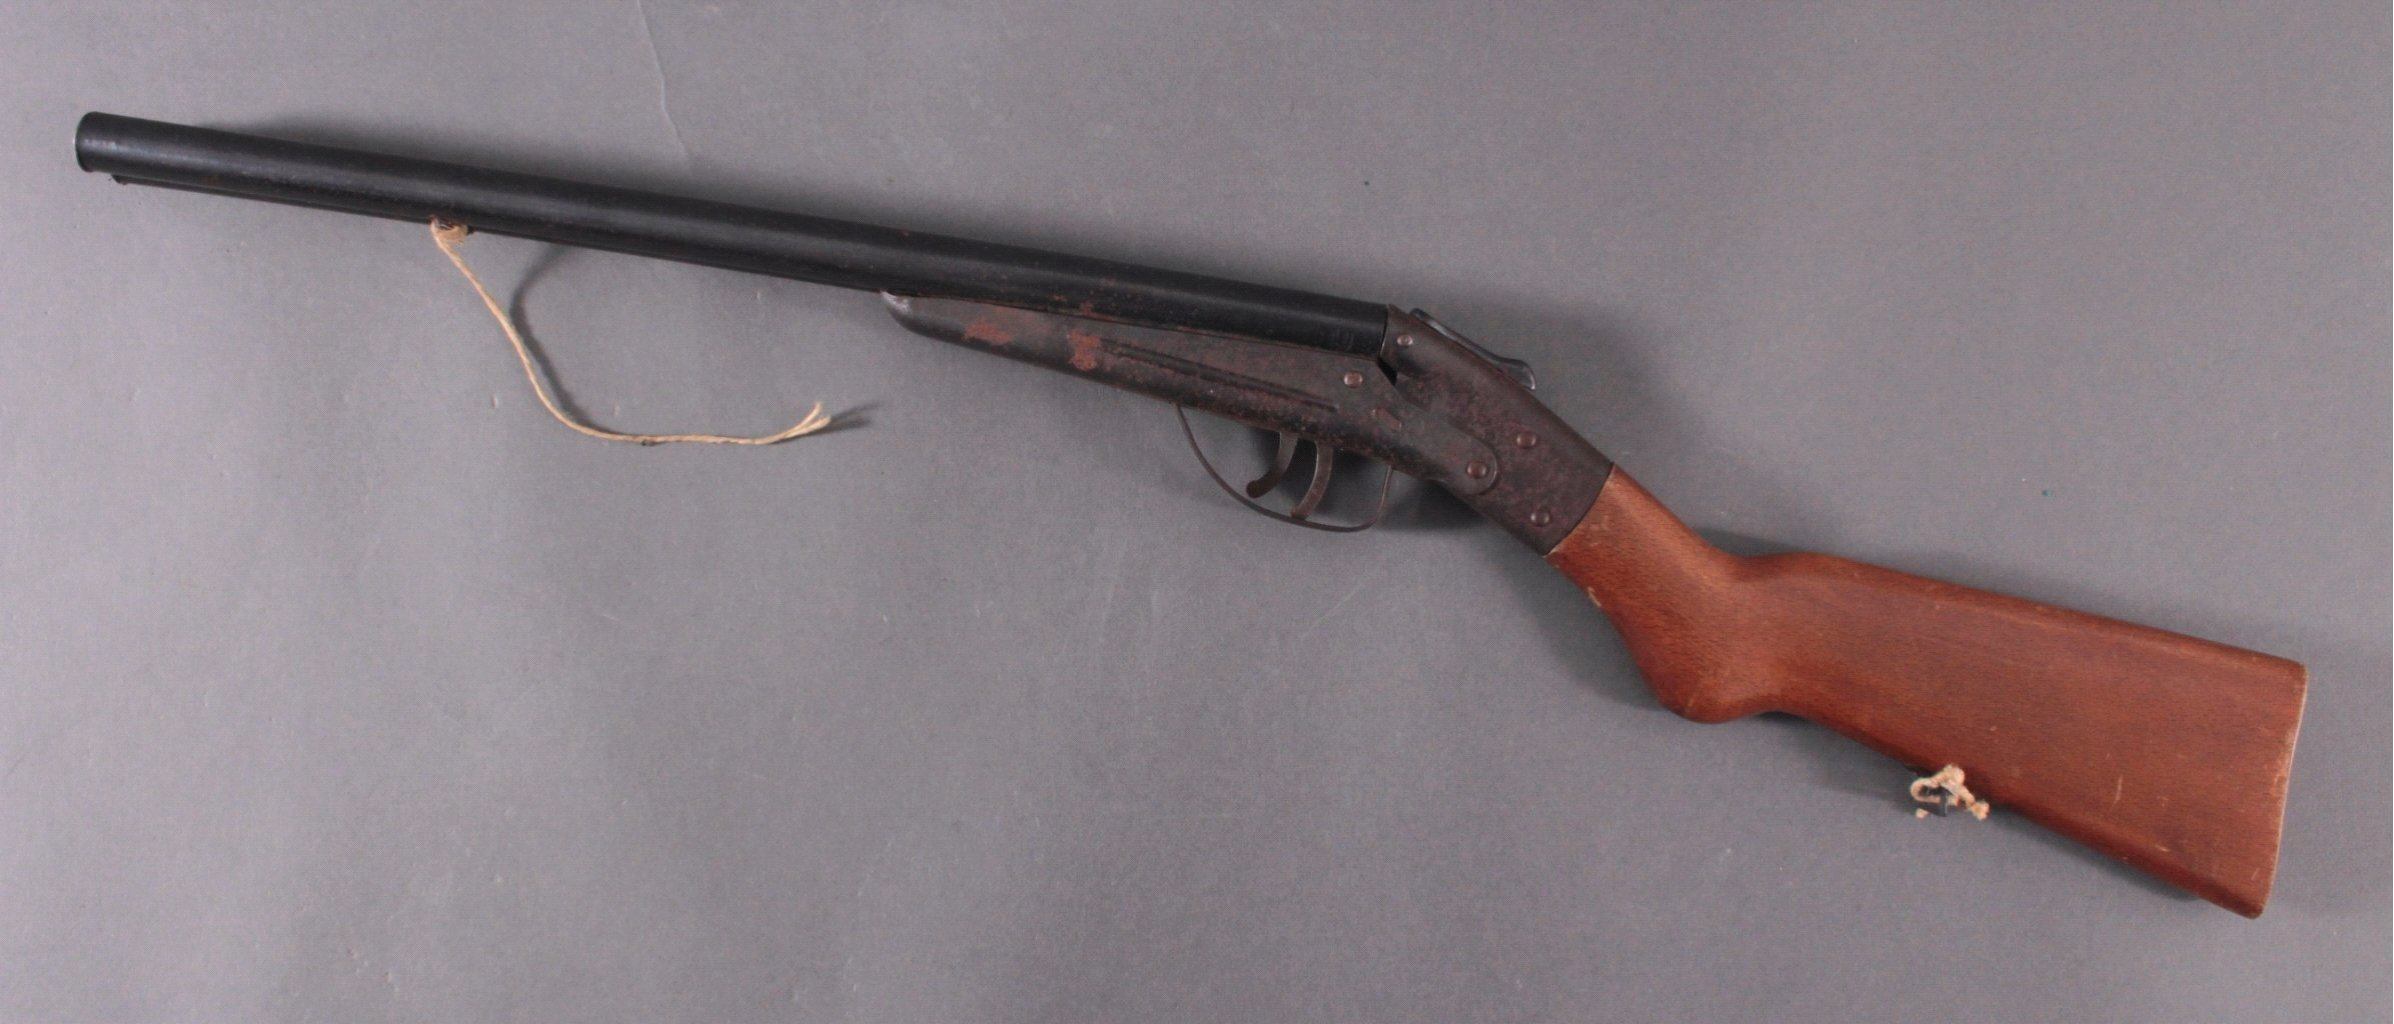 Spielzeuggewehr 1. Hälfte 20. Jh. Doppelflinte-1